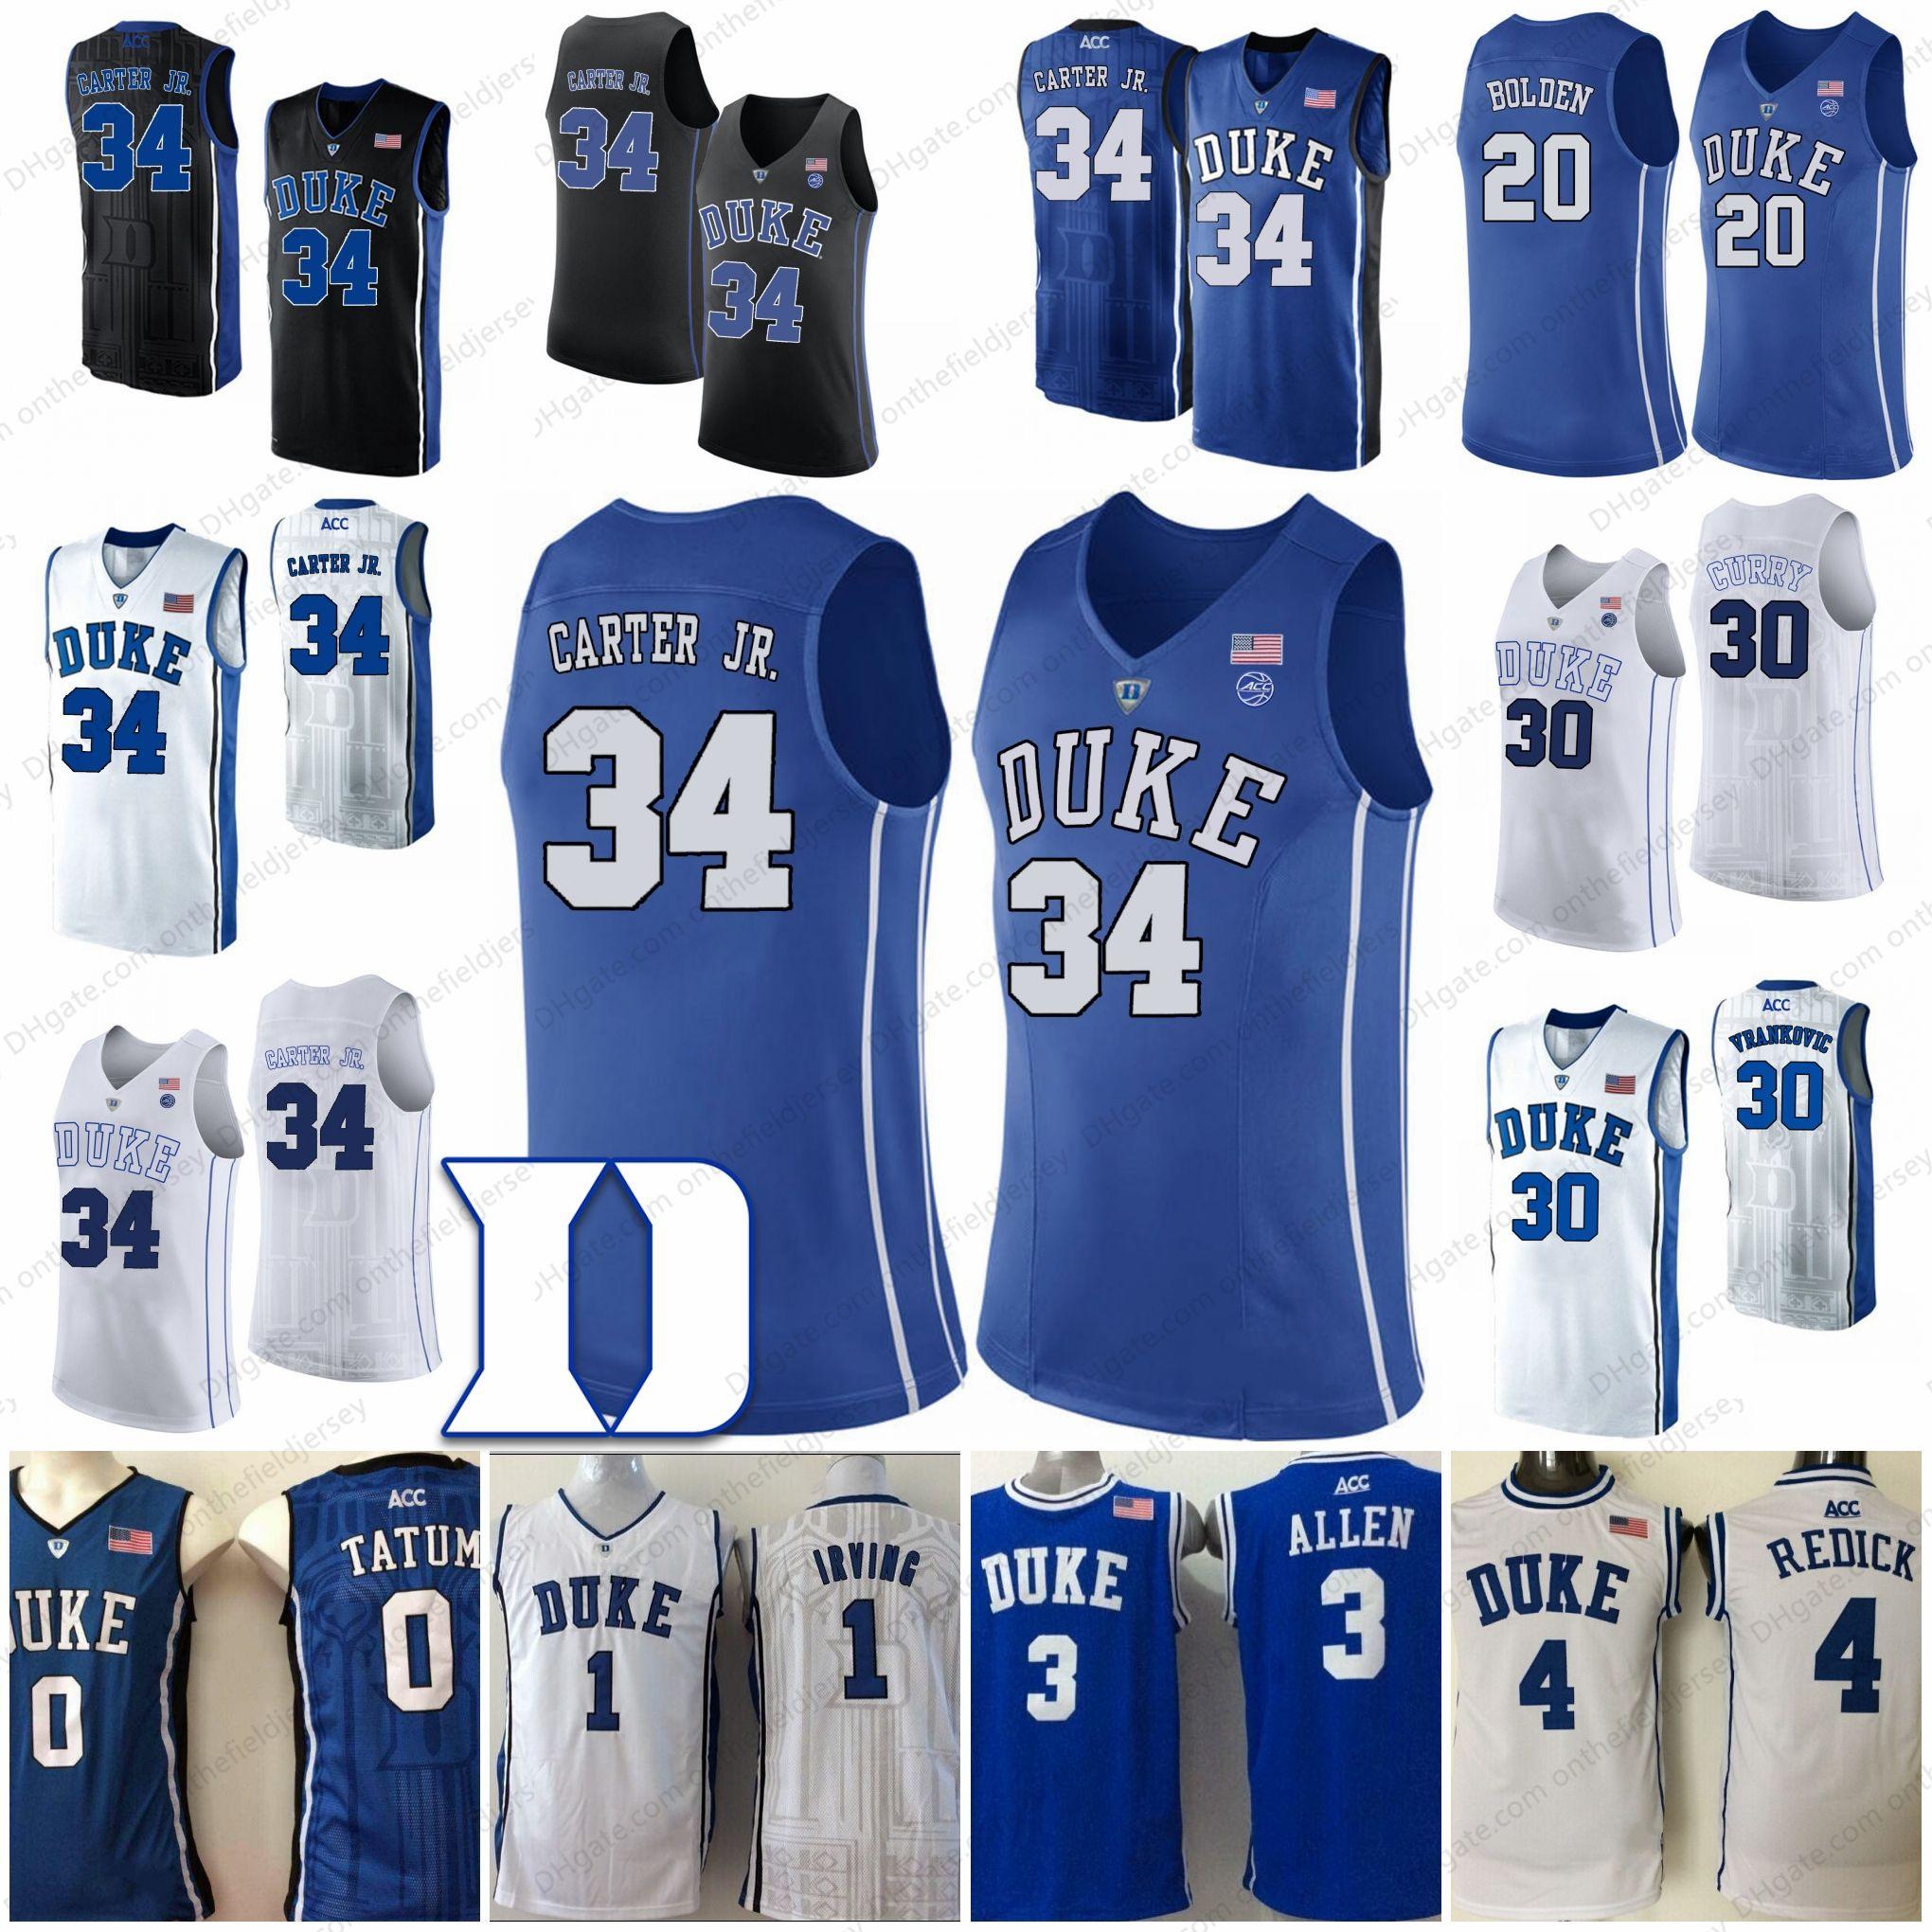 a1258d8014e1 Duke Blue Devils  20 Marques Bolden 30 Antonio Vrankovic 34 Wendell ...